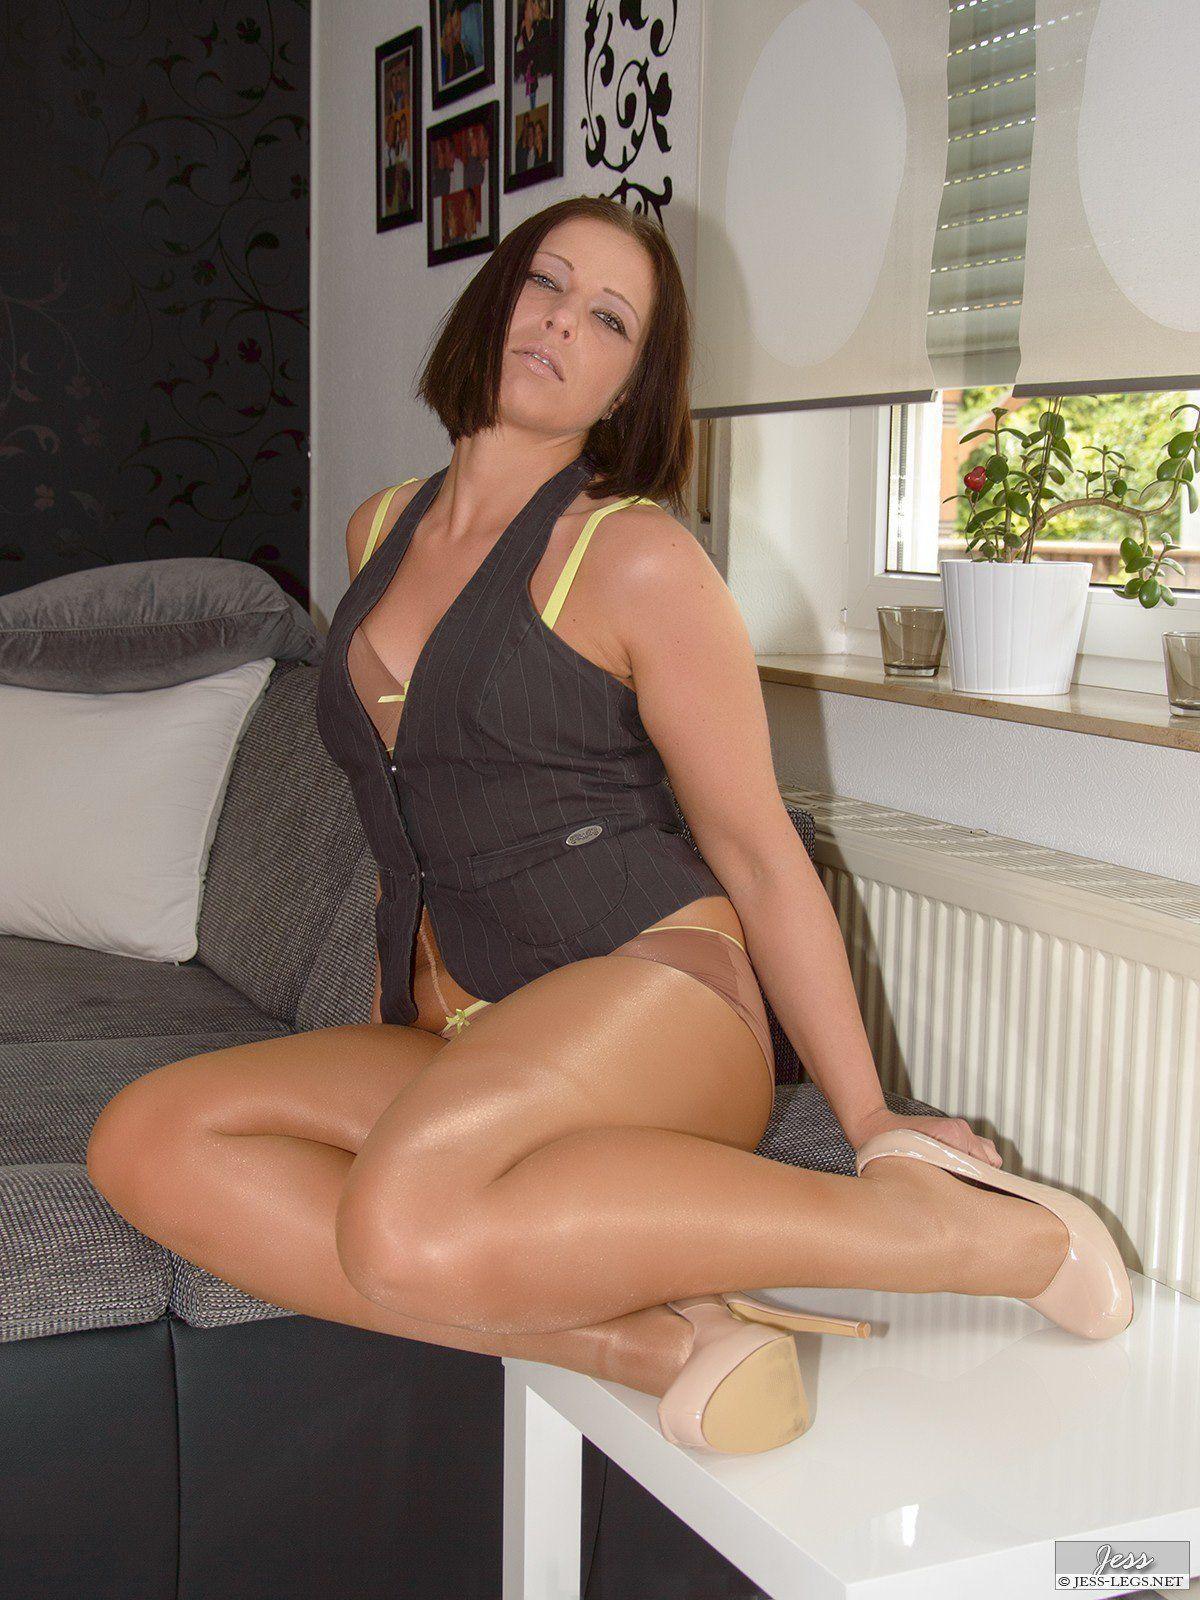 Anya mpl ass nude